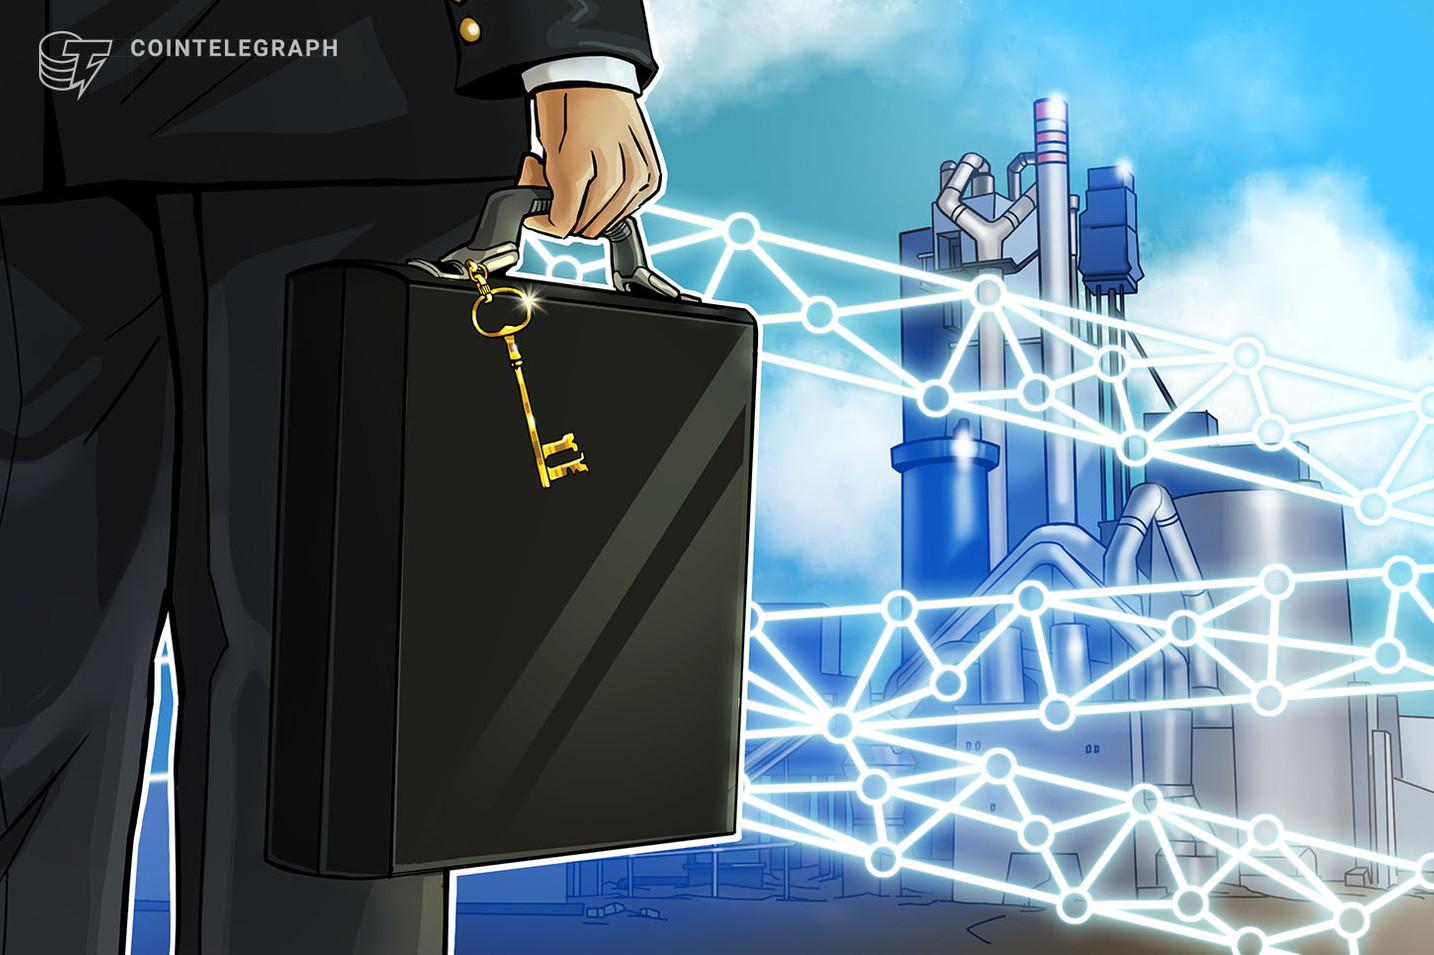 La plataforma de tokens de valor de EE.UU. TokenSoft se une a Blockchain Association